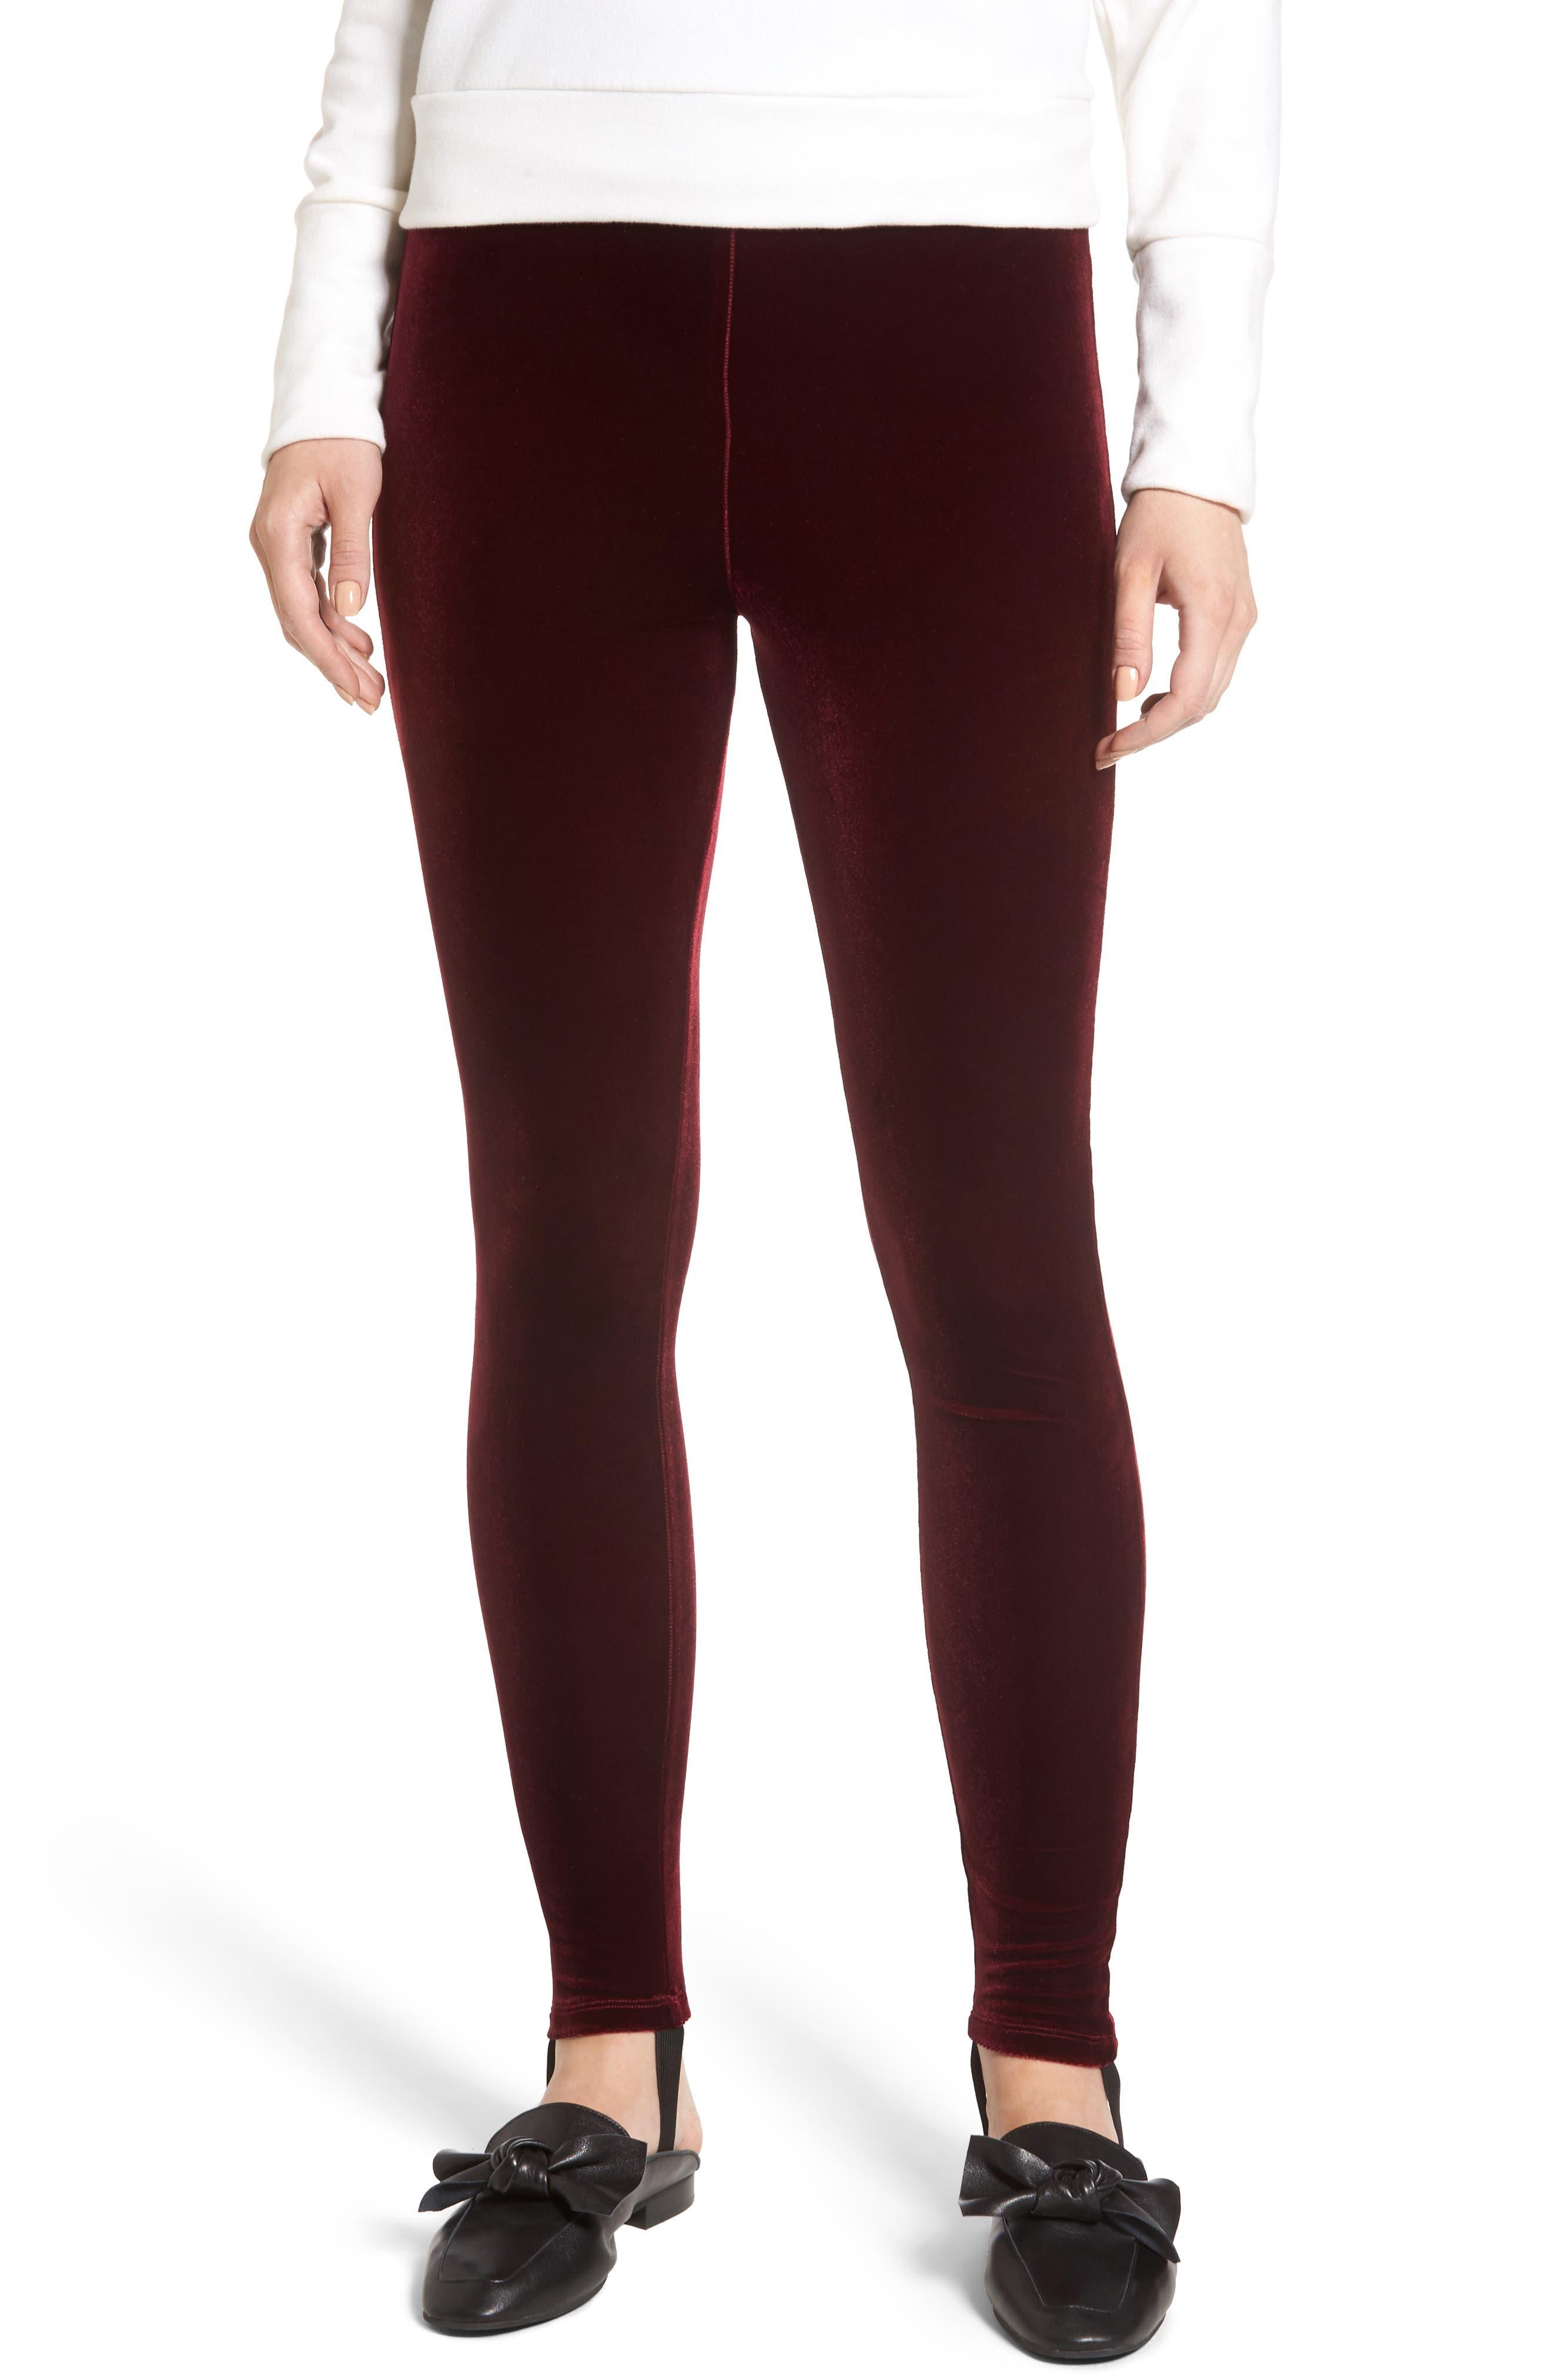 High Waist Velour Stirrup Pants,                             Main thumbnail 1, color,                             Red Tannin